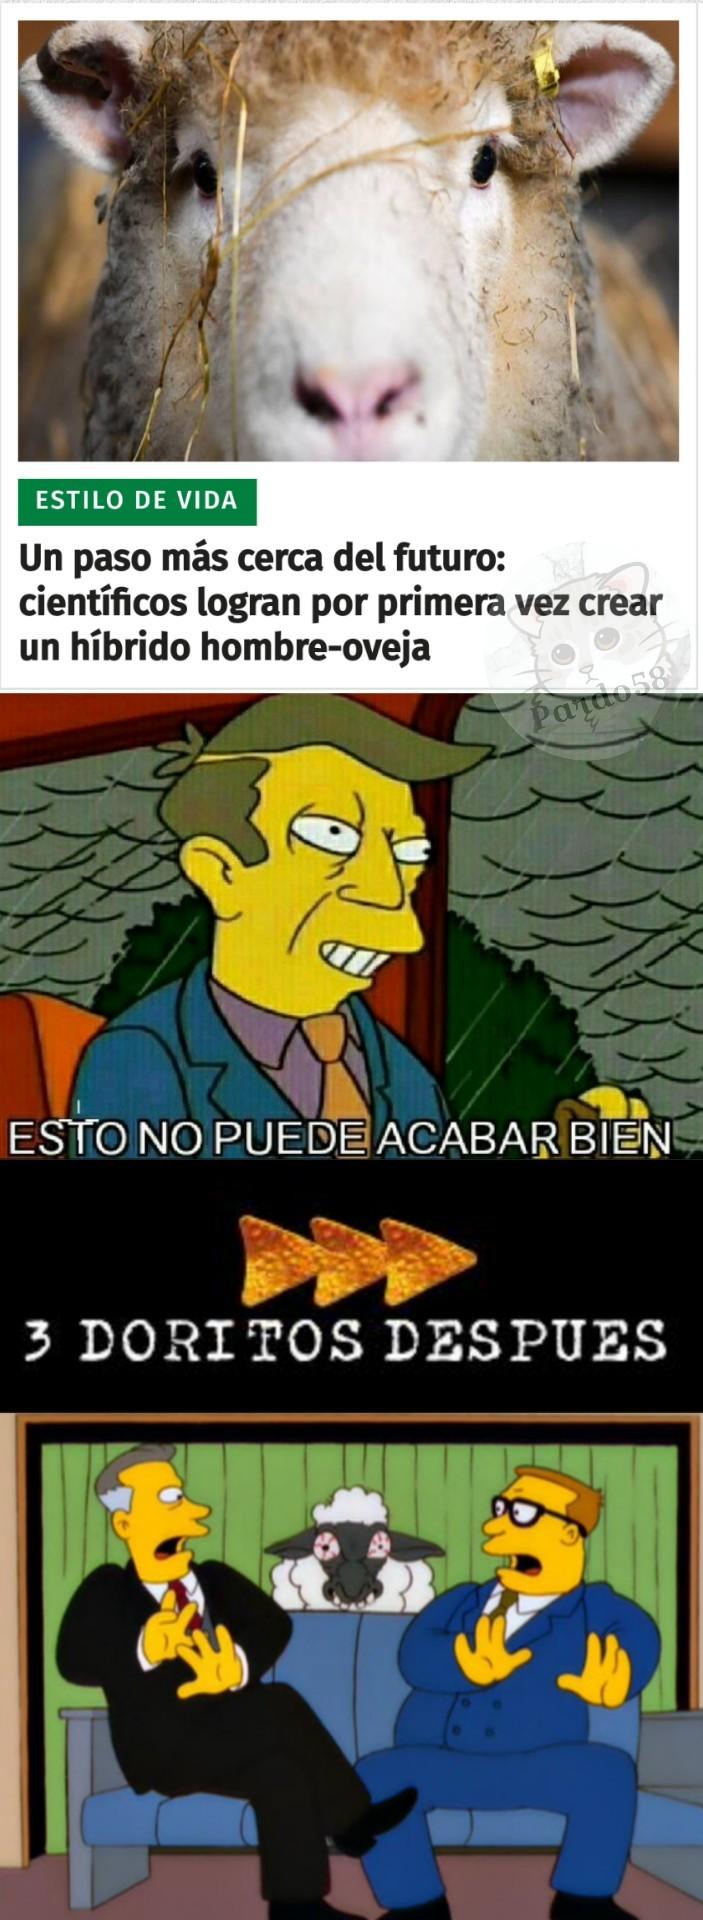 Tomacooo!! •>• - meme